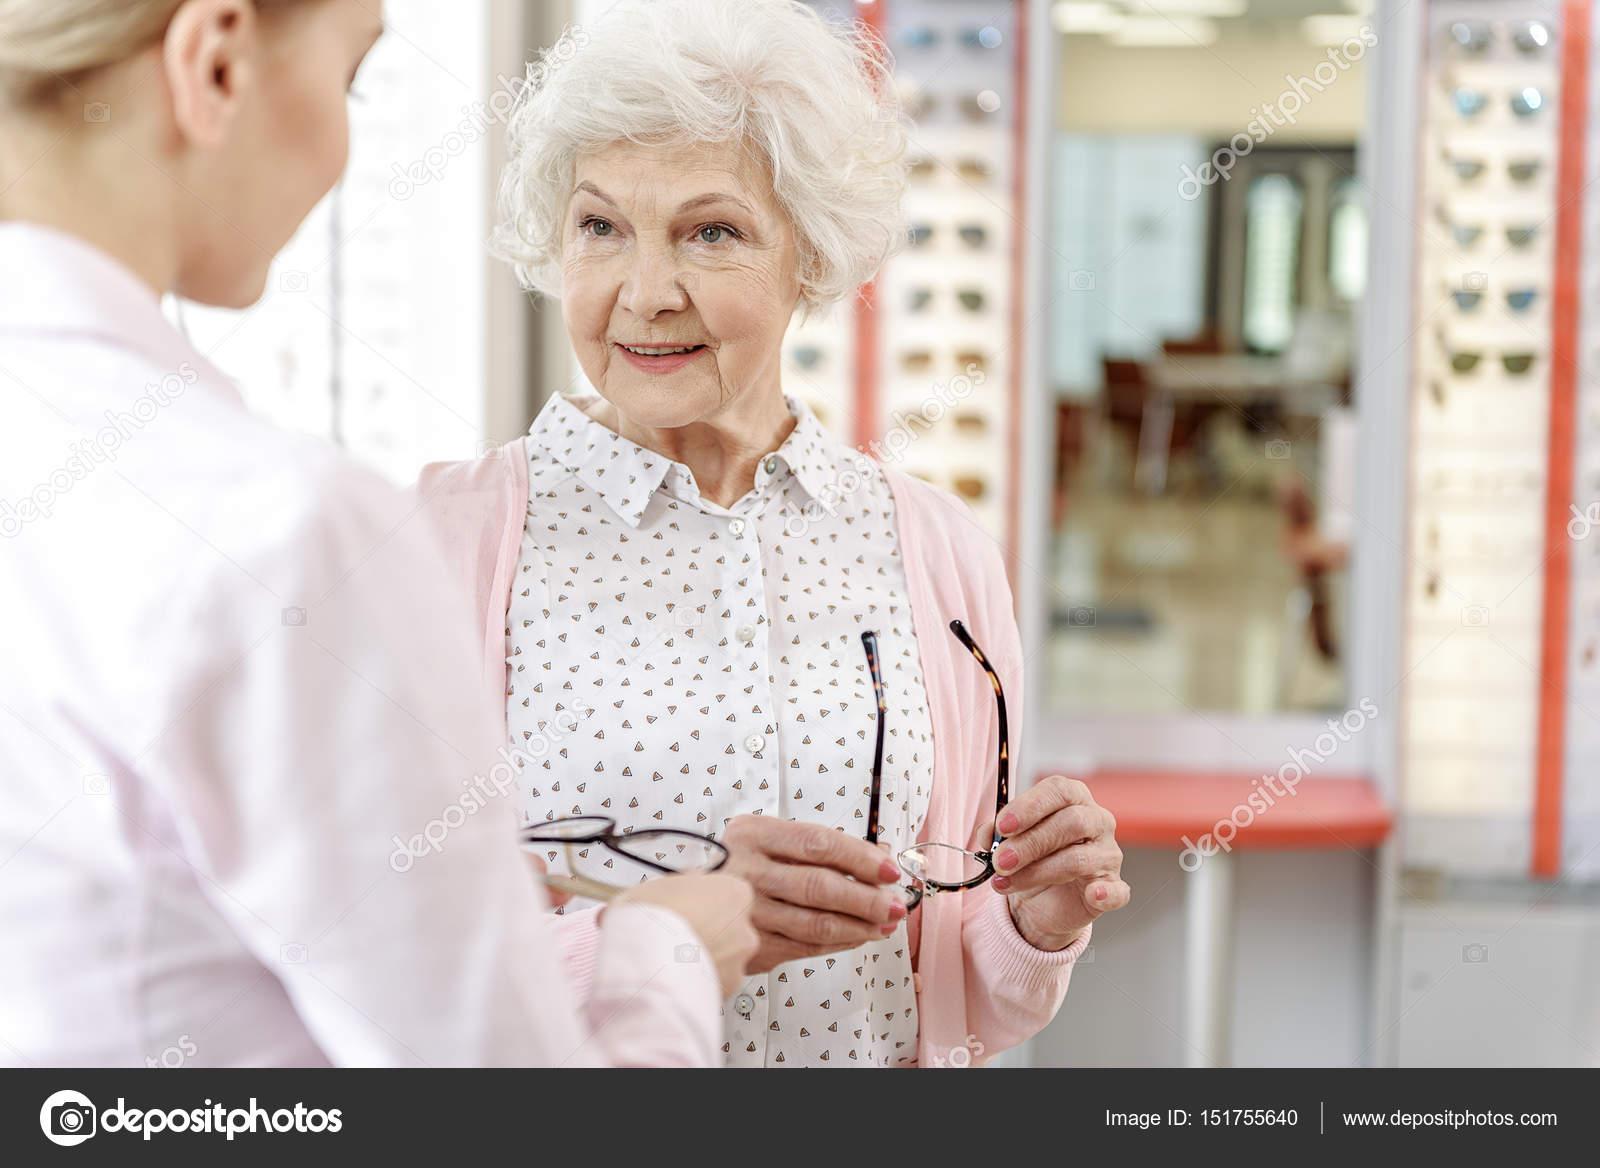 67043b3795 Παλιό γυναικείο πρόσωπο στο κατάστημα οπτικών — Φωτογραφία Αρχείου ...